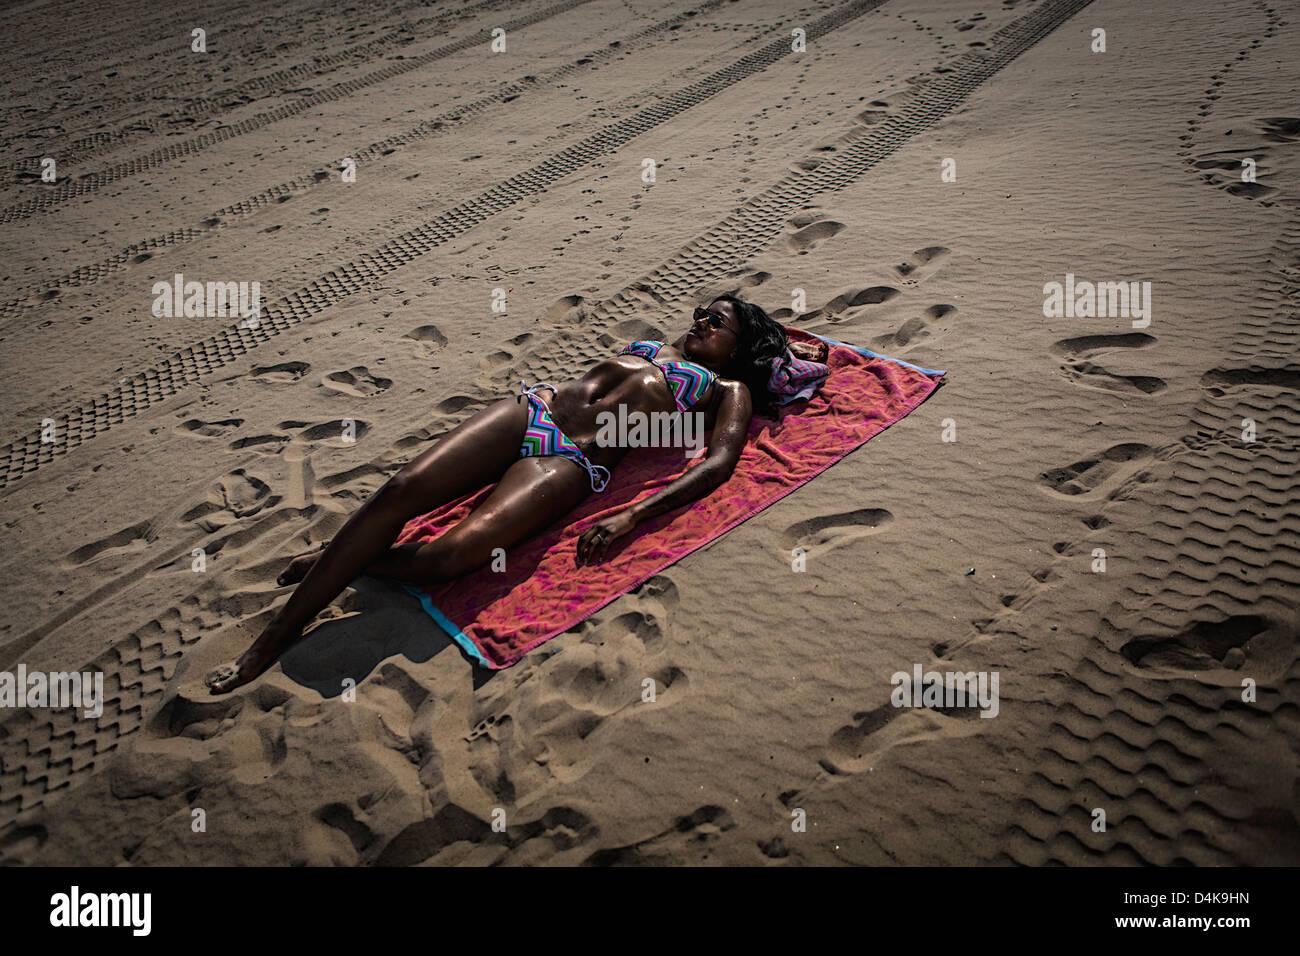 Woman sunbathing on towel on beach - Stock Image